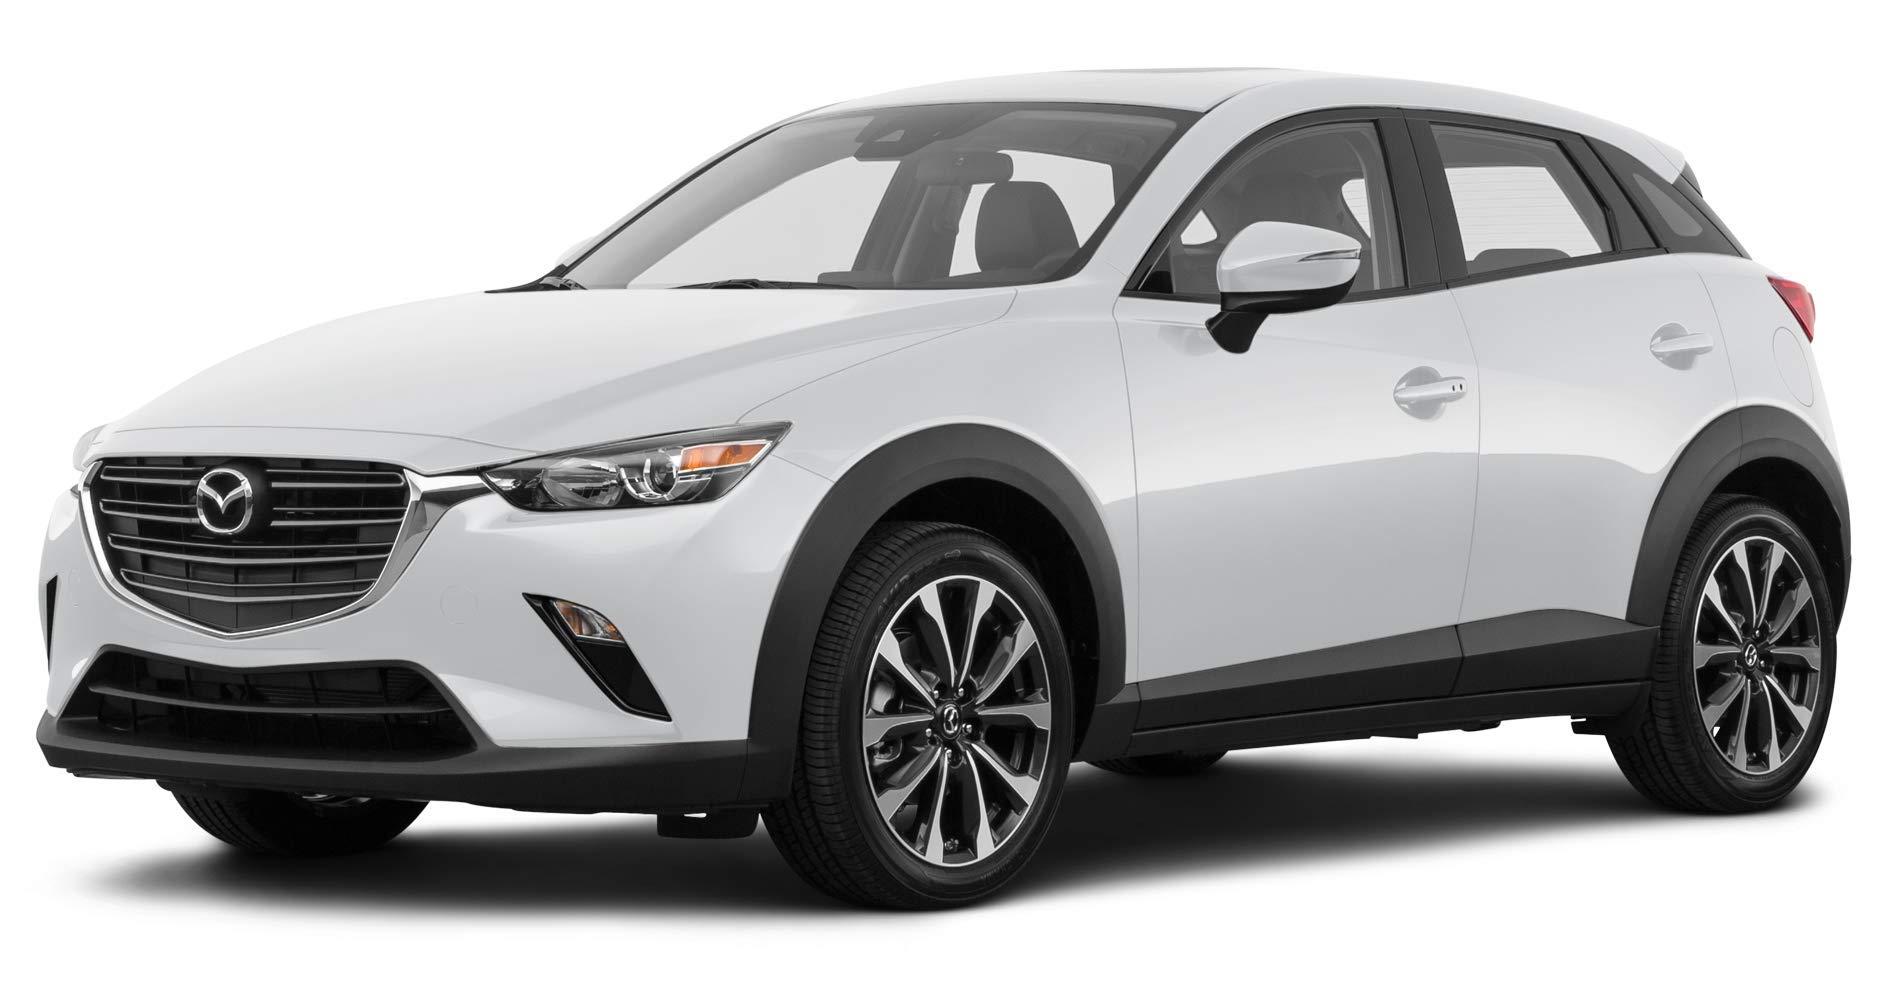 Kekurangan Harga Mazda Cx 3 Spesifikasi